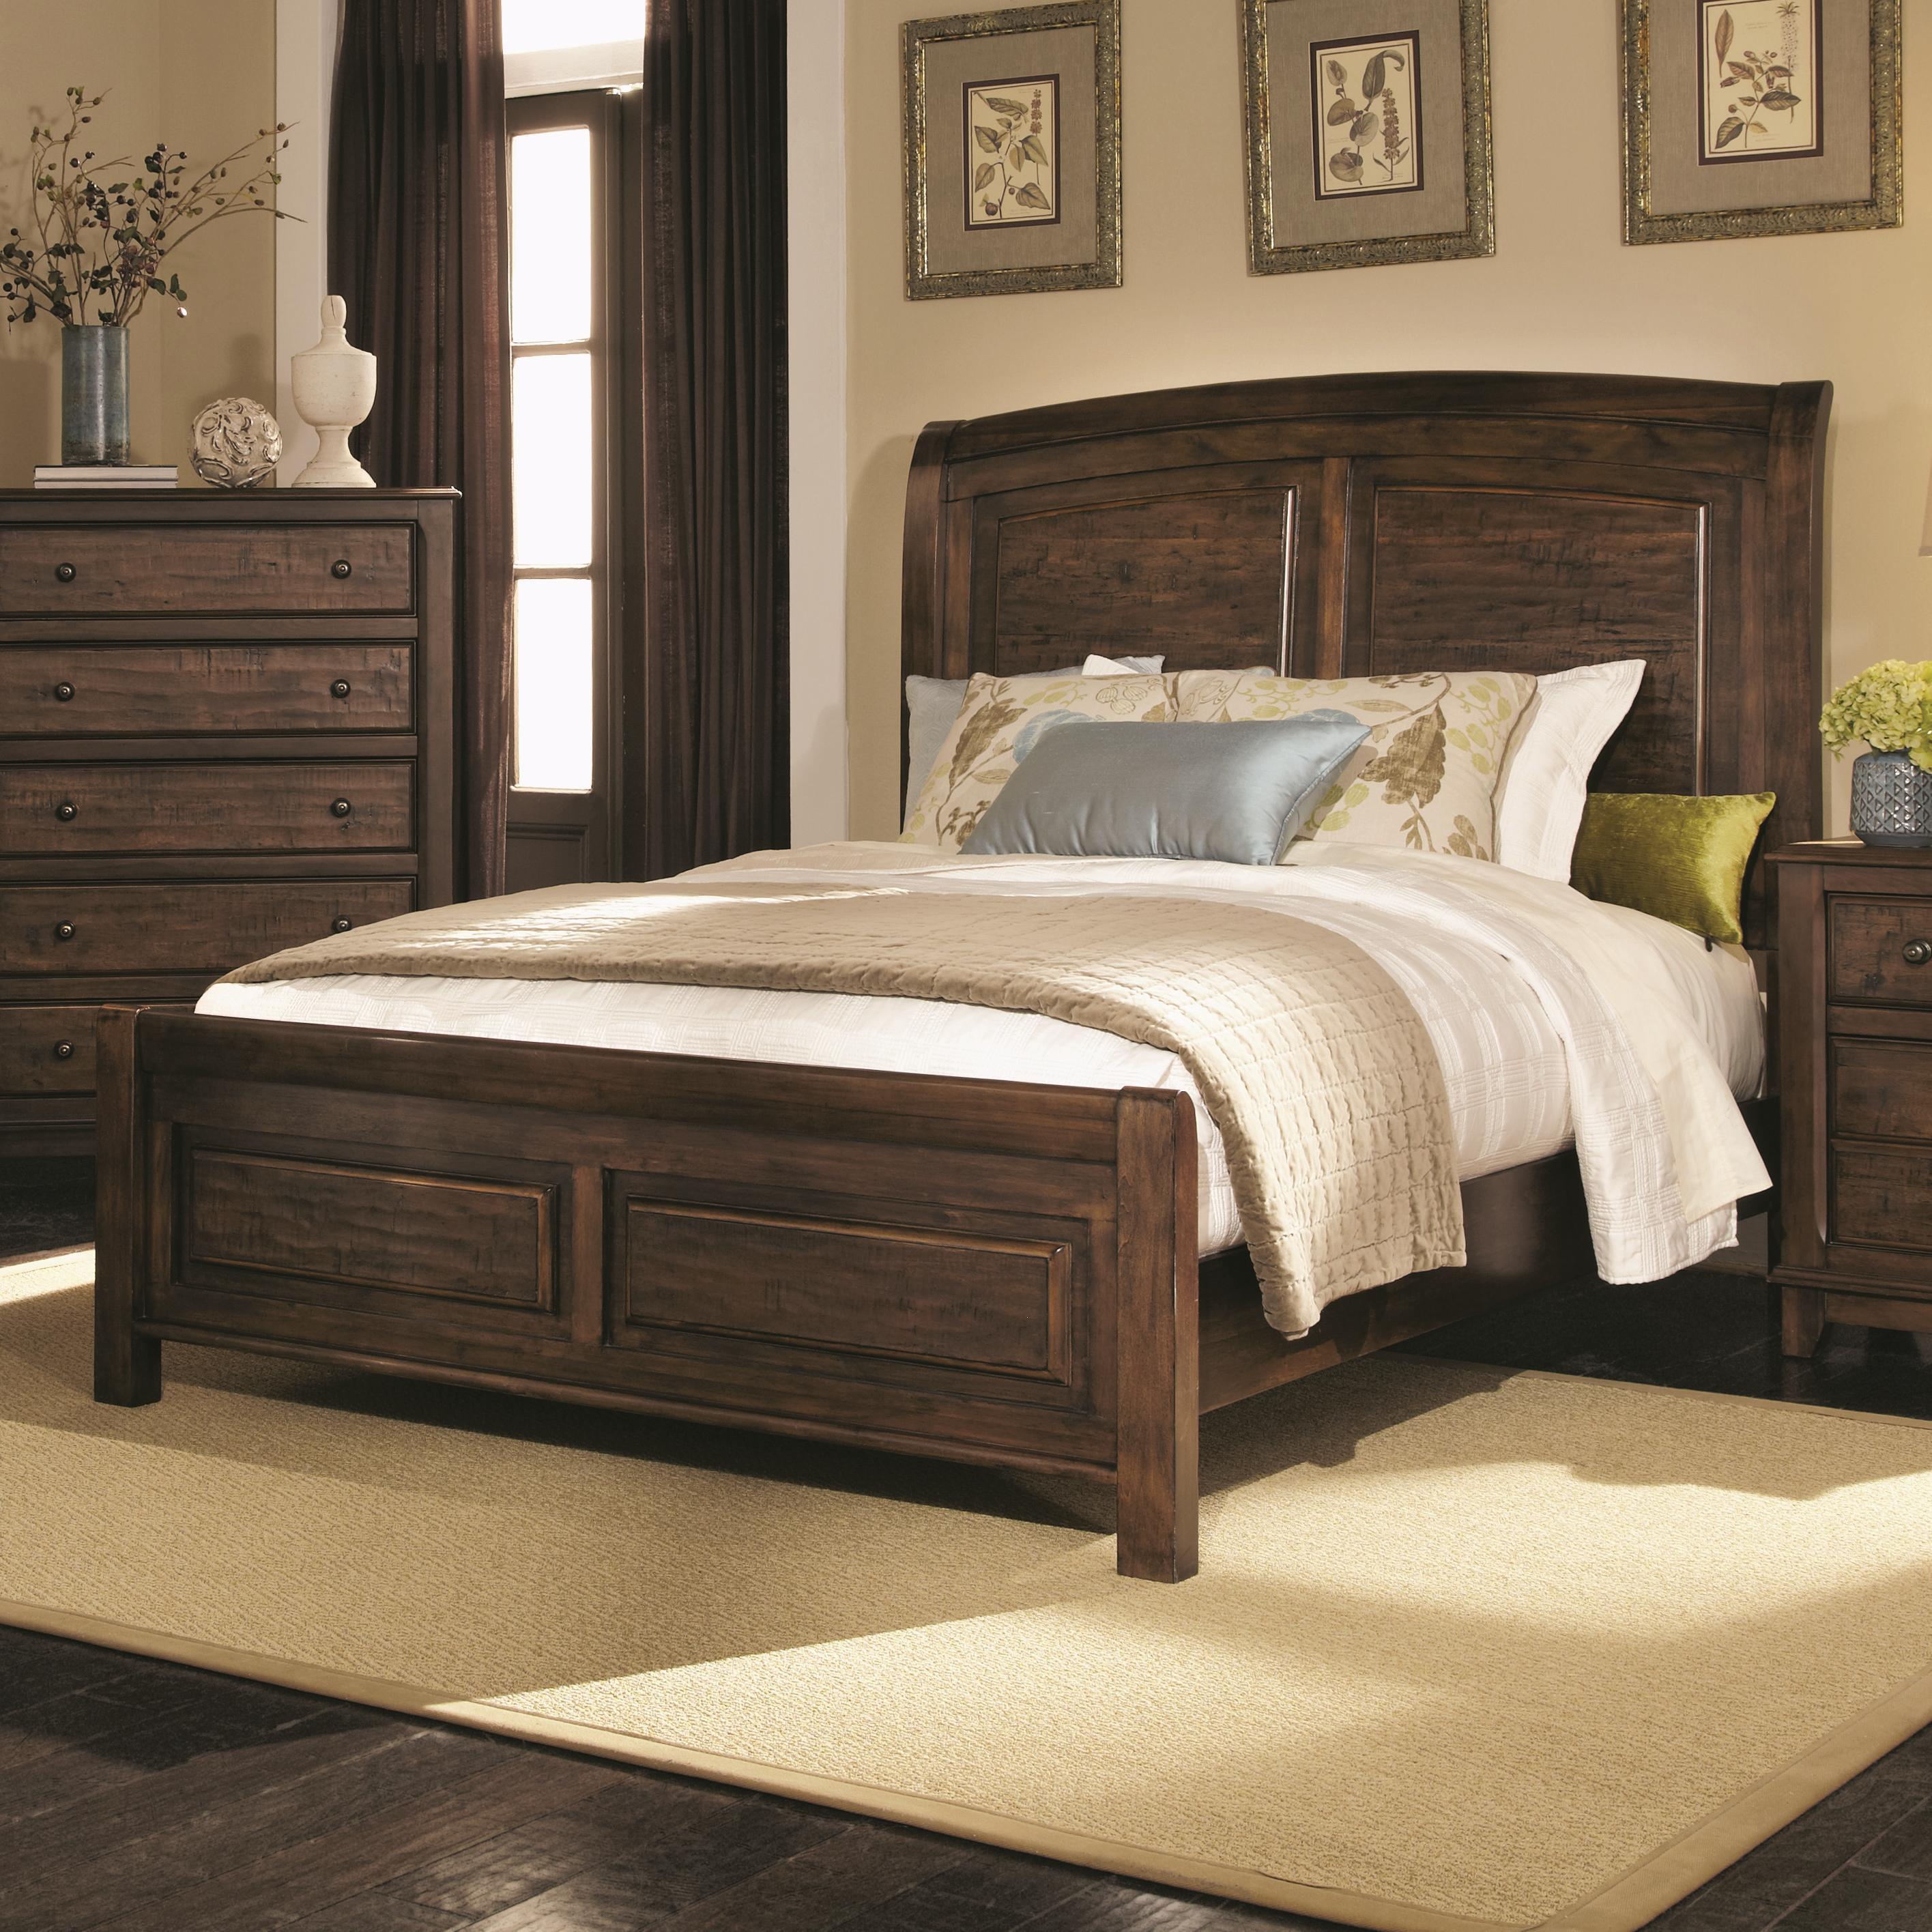 Coaster Laughton Queen Sleigh Bed - Item Number: 203260Q